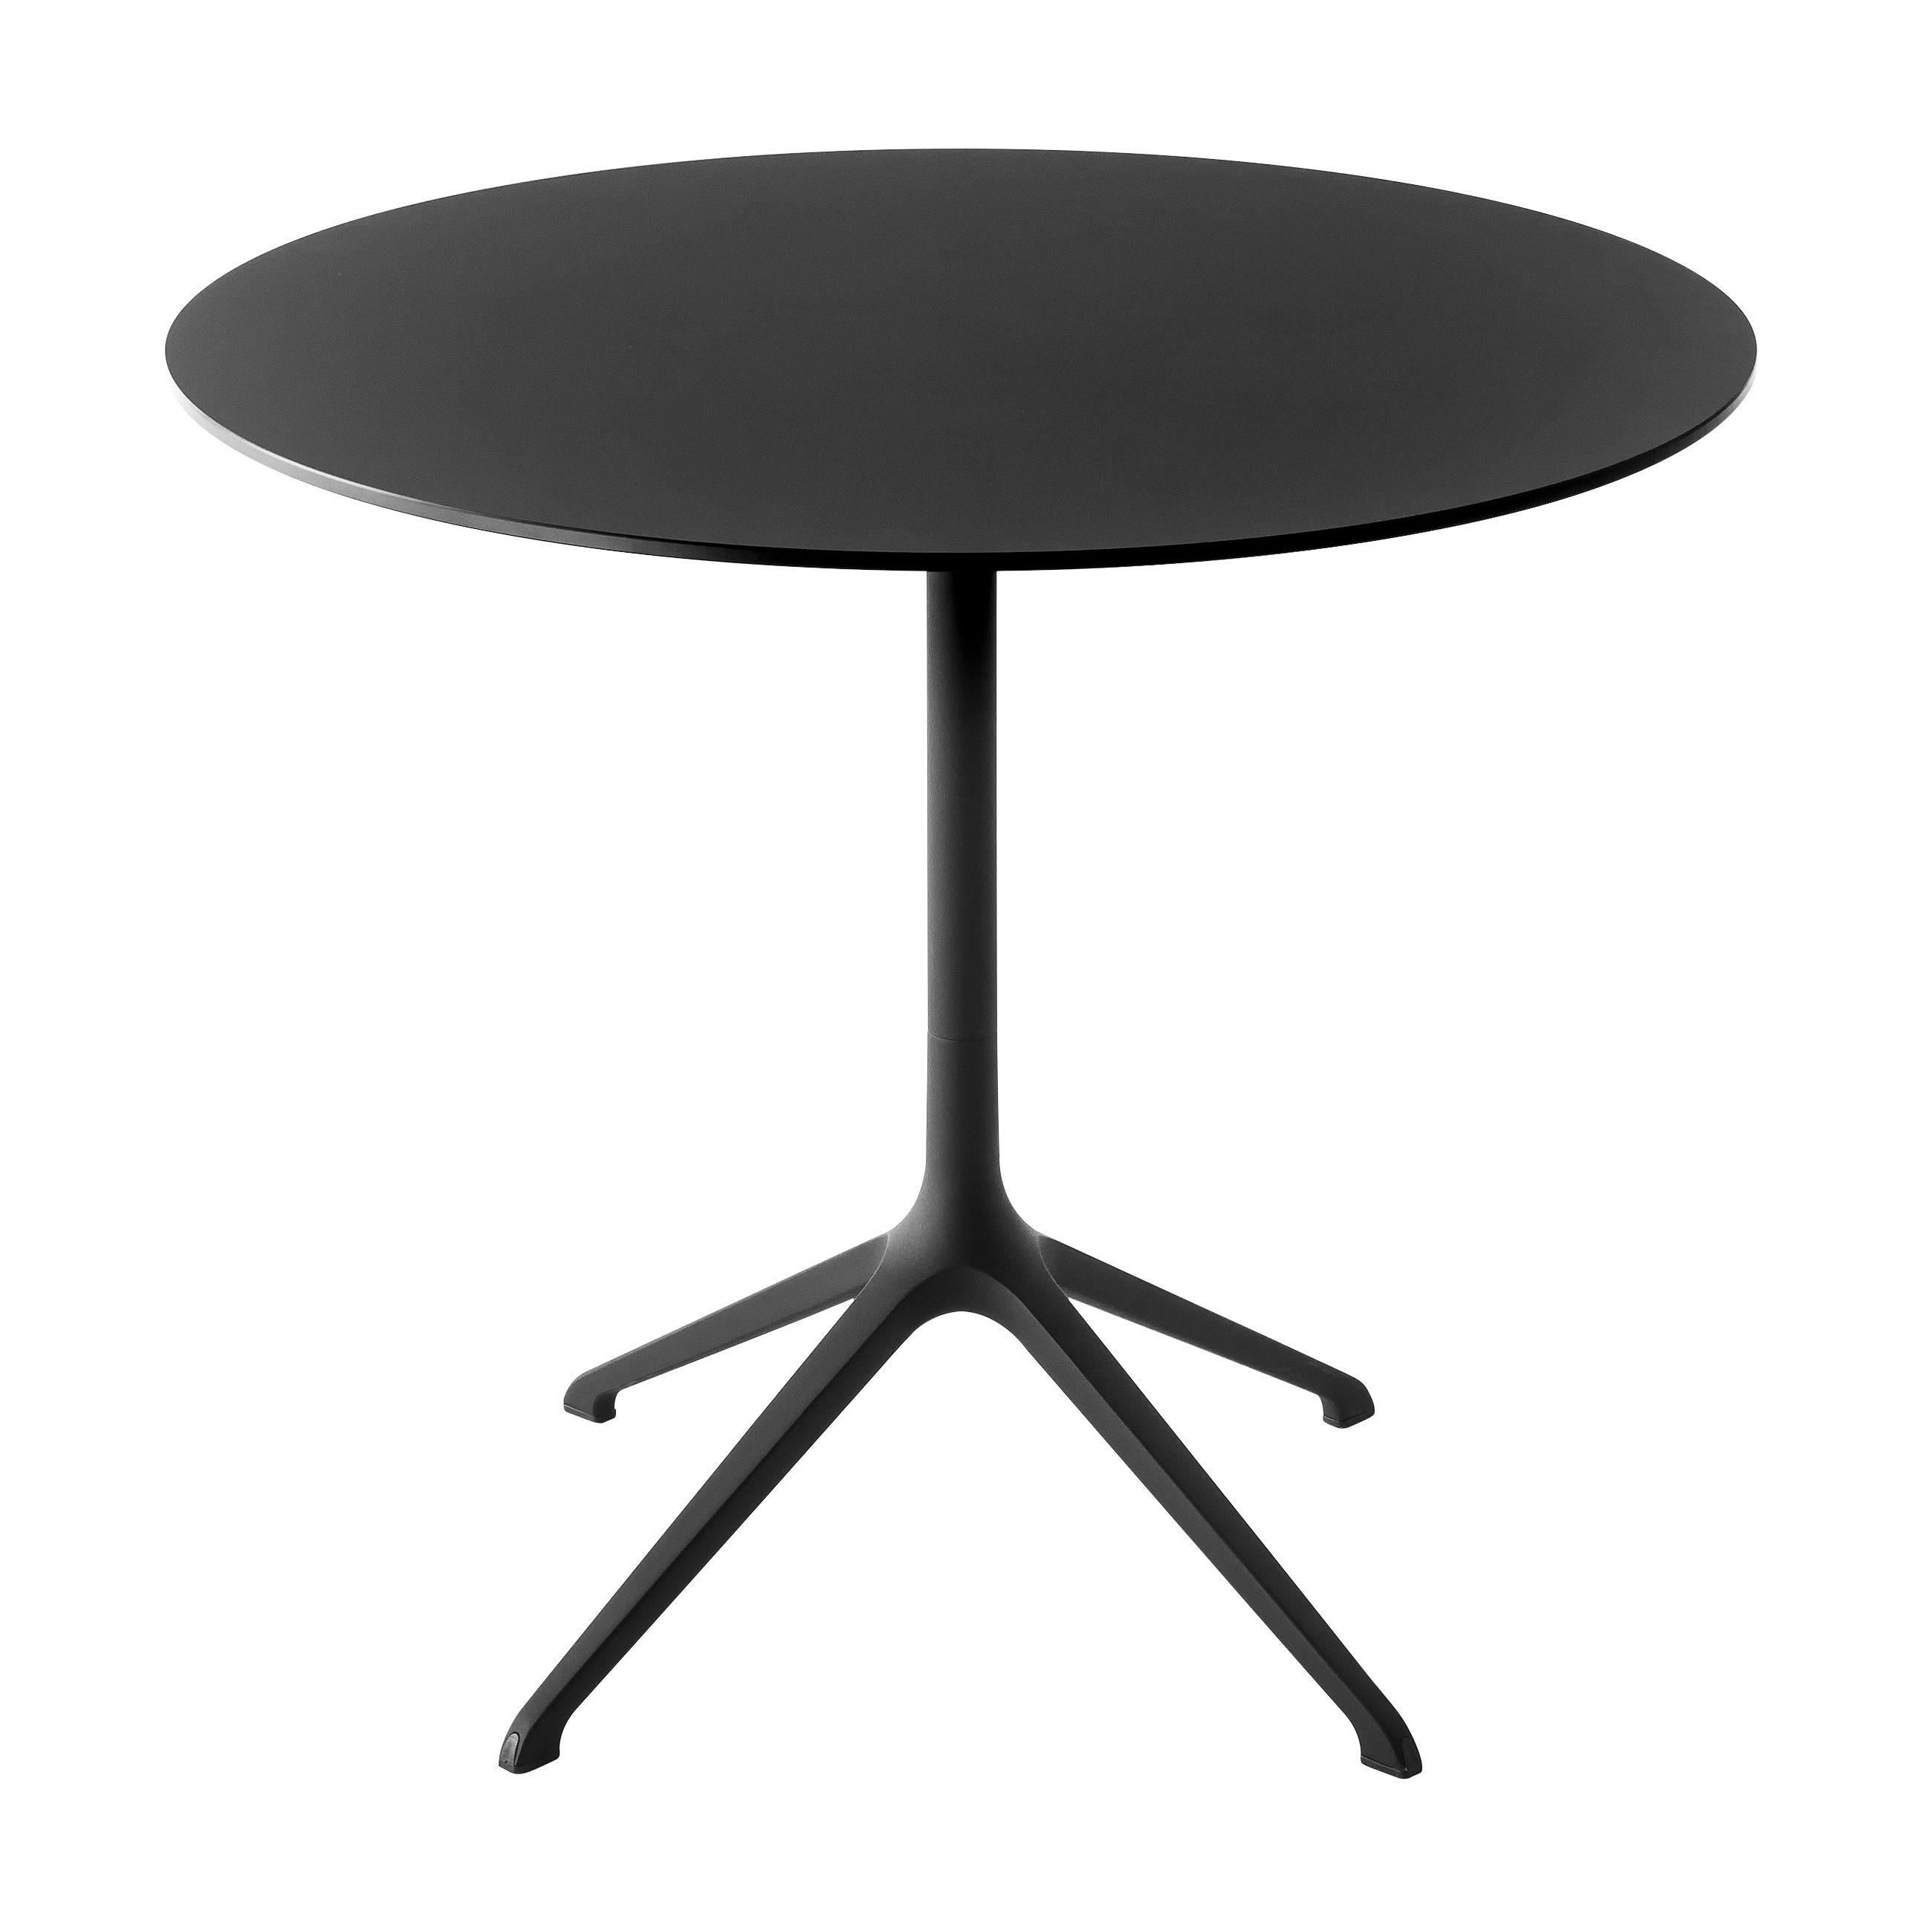 Outdoor - Tables de jardin - Table pliante Elephant / Ø 90 cm - Kristalia - Noir - Aluminium laqué, Laminé